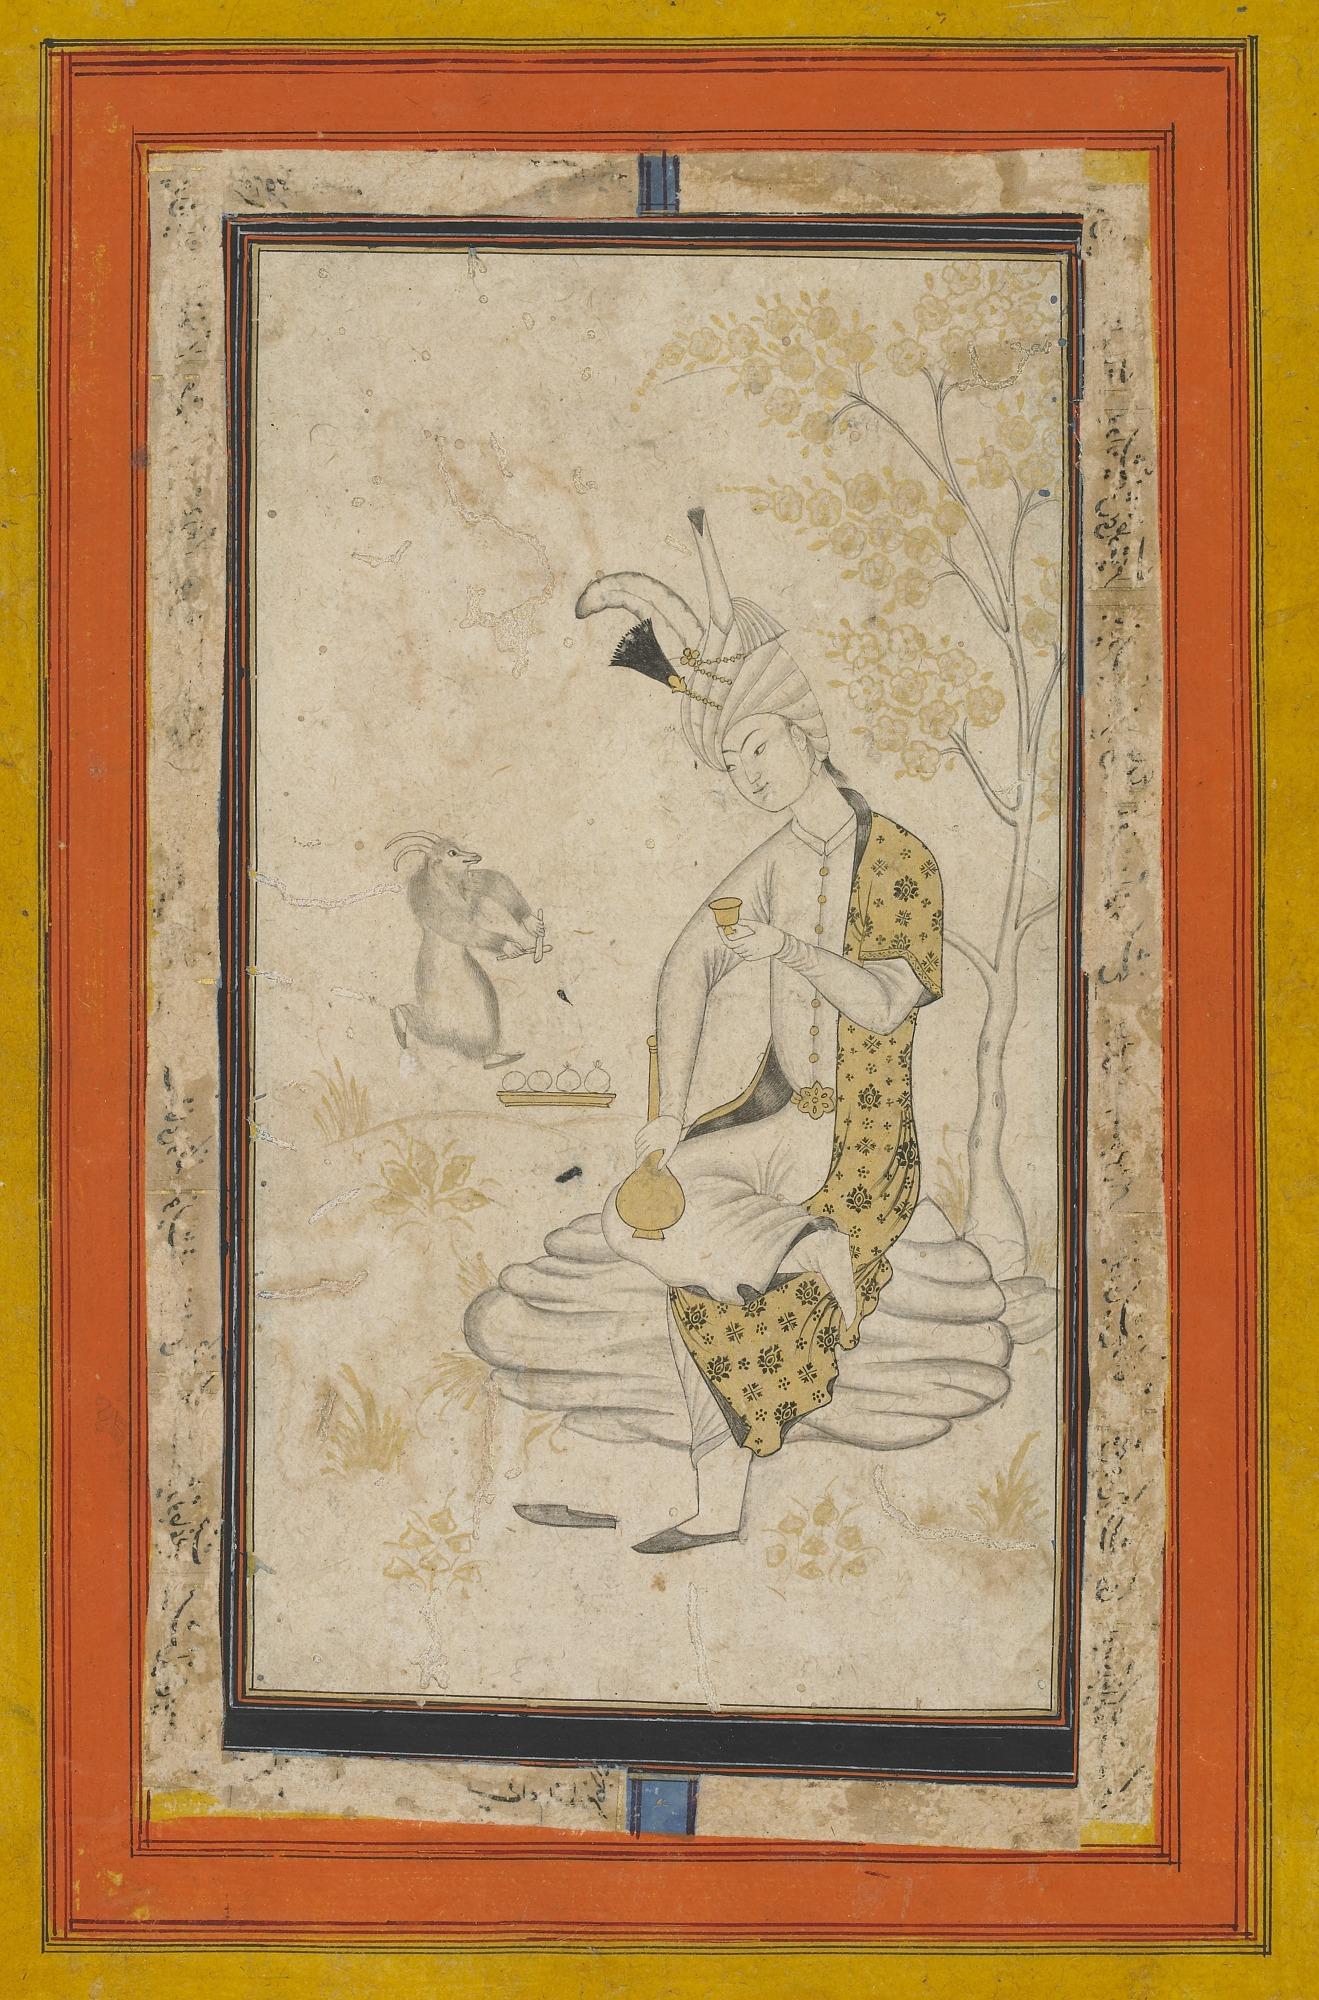 Shah Tahmasp I seated on rock